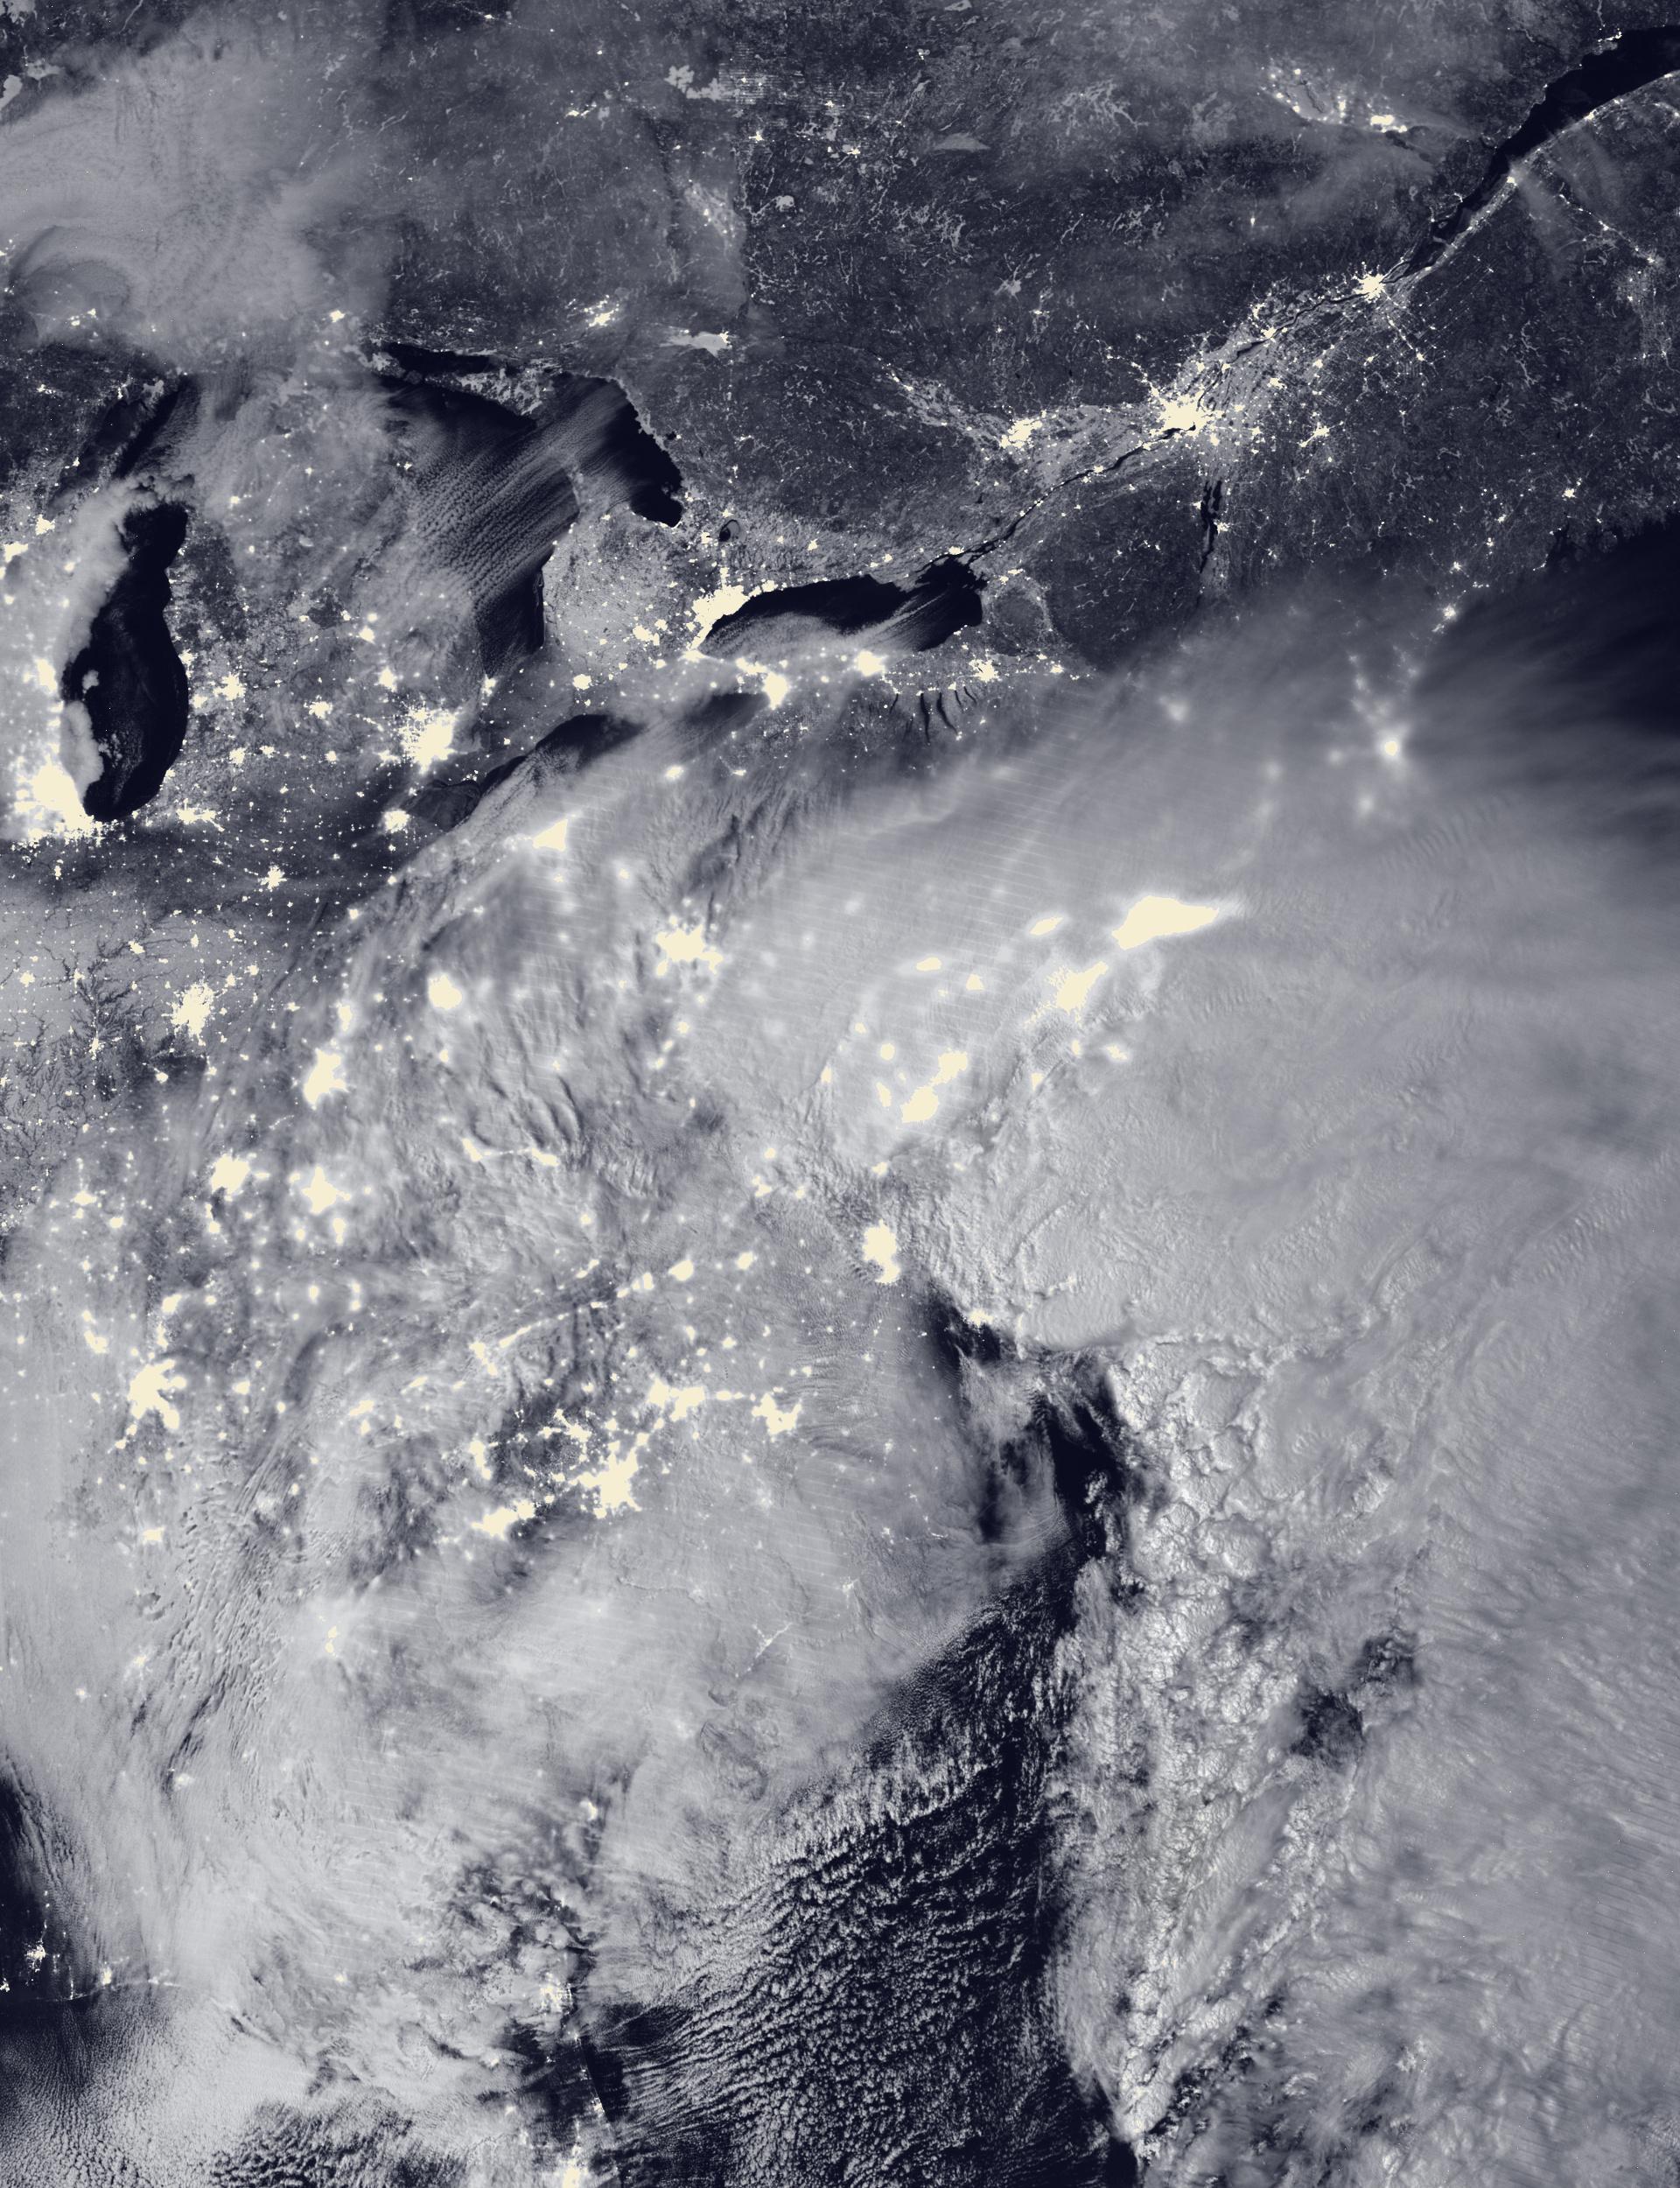 Snowzilla - Tempête Jonas - Neige - New York - Washington - Côte est - Suomi NPP - VIIRS - 23 janvier 2016 - NASA